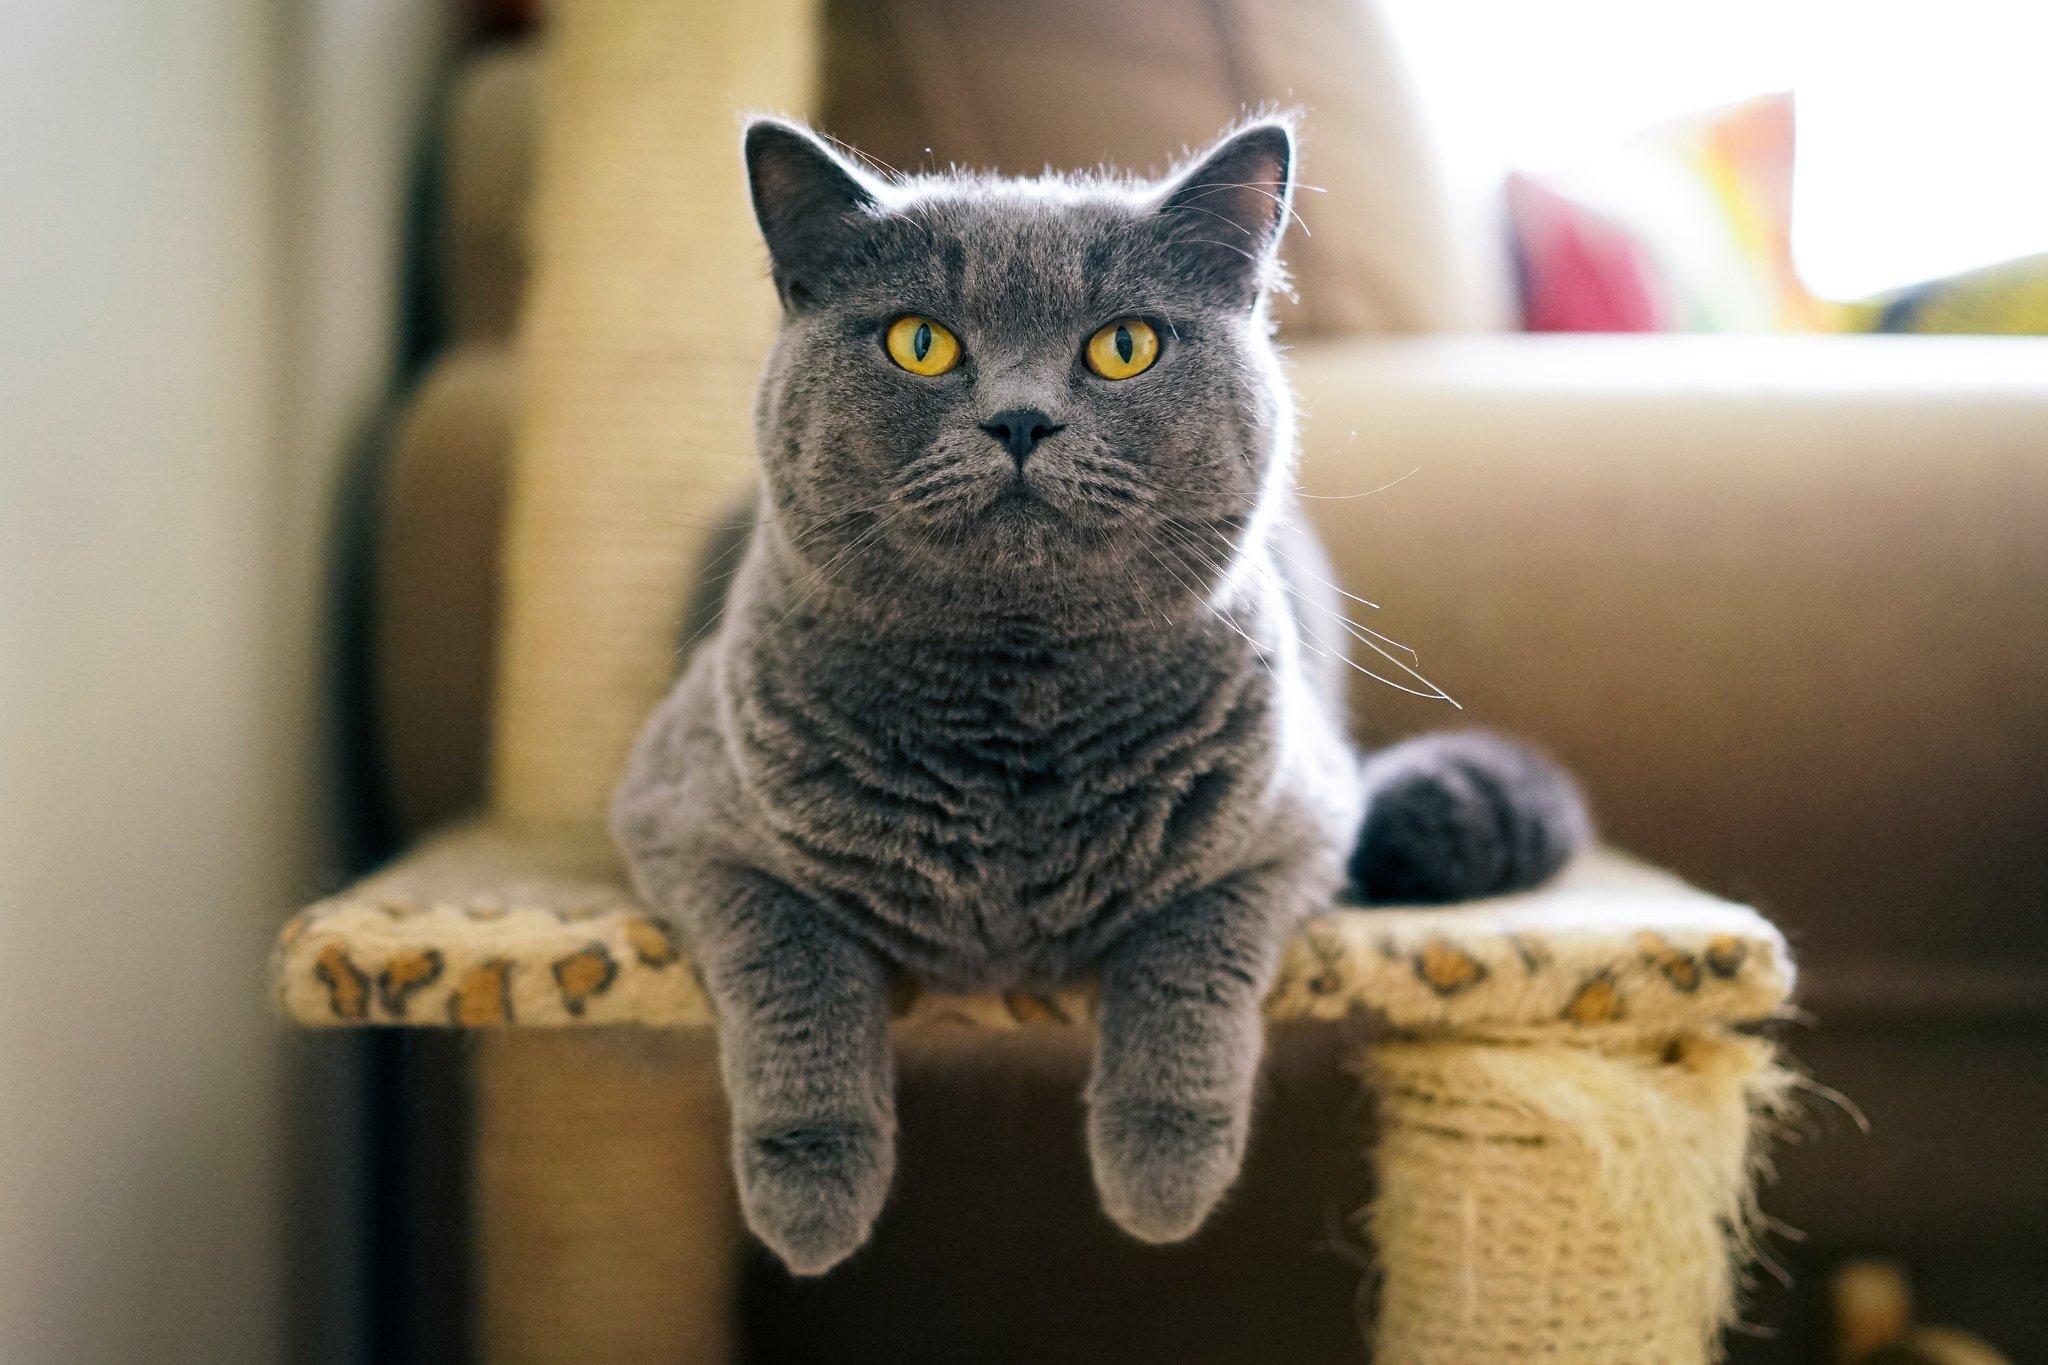 номеров картинки британских котов на телефон описание фото